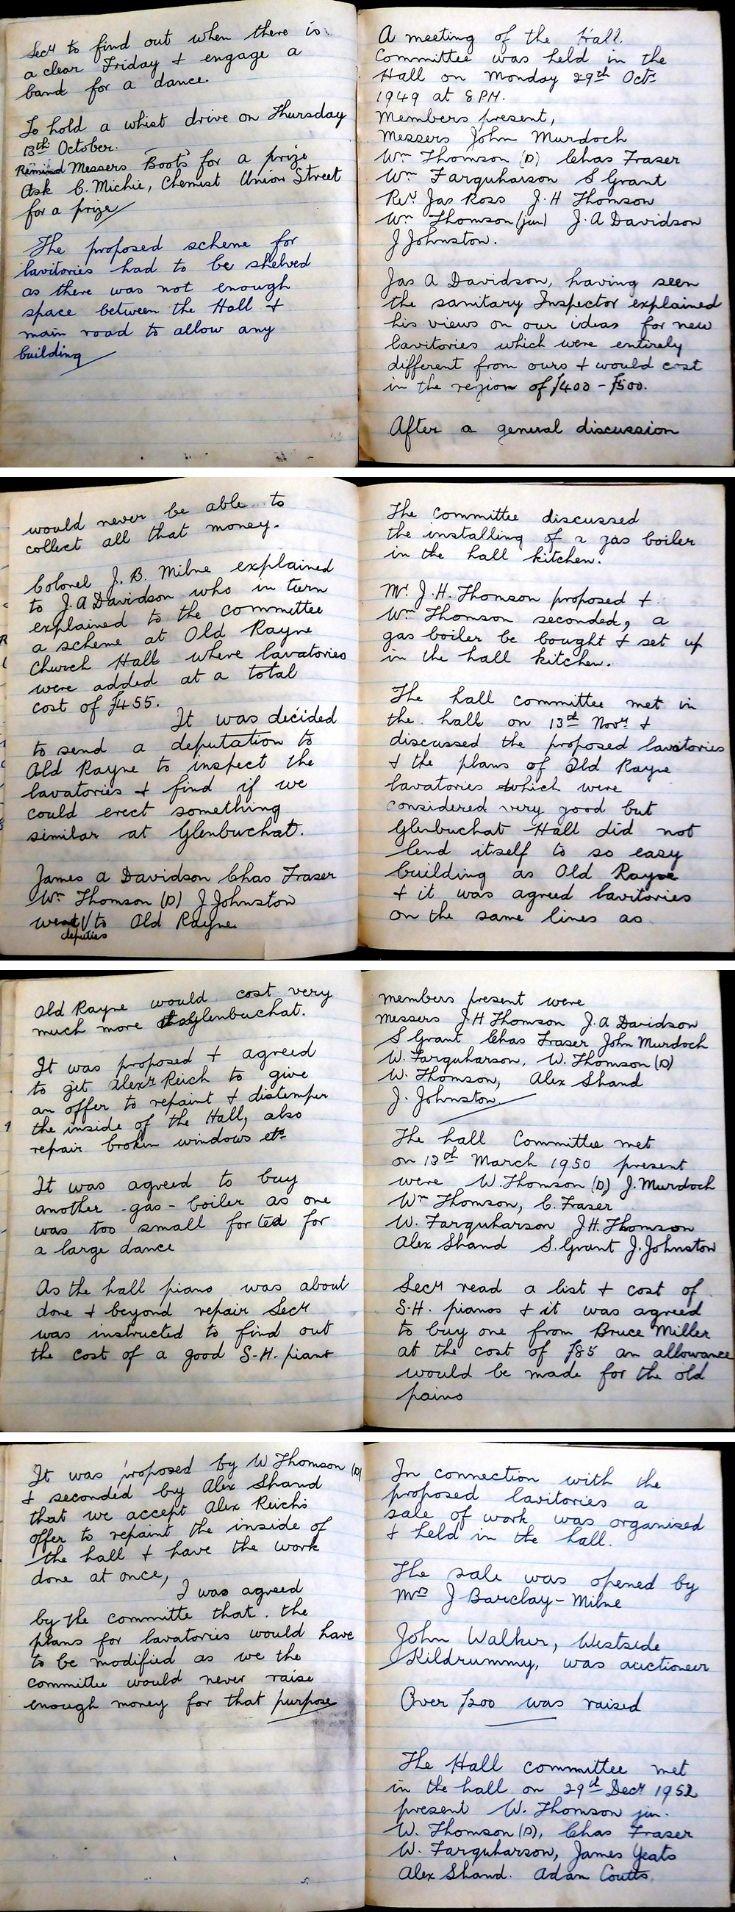 41 Glenbuchat Hall Committee Minutes